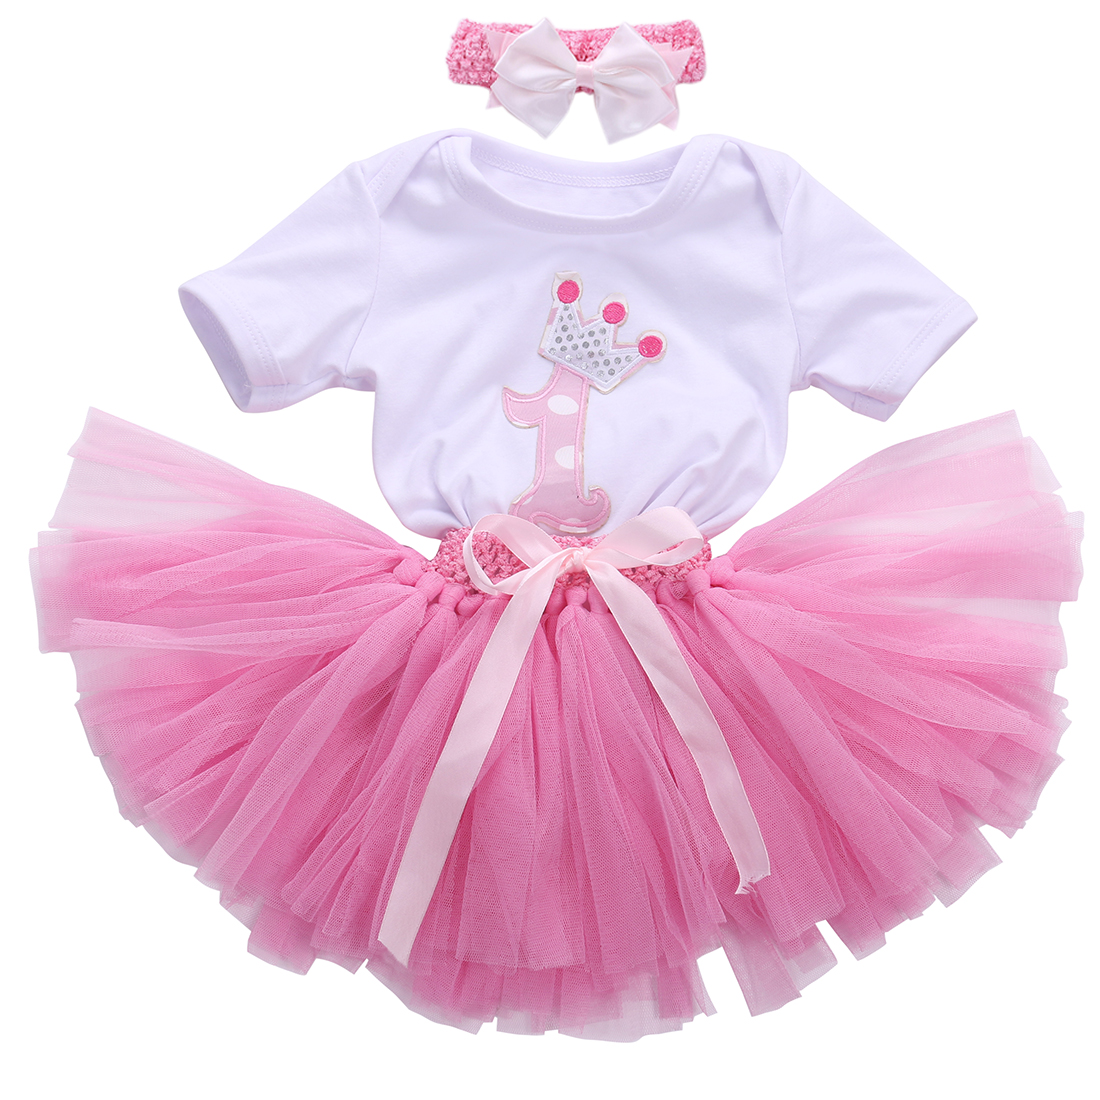 Kids Baby Girl Birthday Dress One Year Clothing Set White Short T-Shirt Romper Tops+Pink Tutu Cake Dress+Bow Headhand Outfits